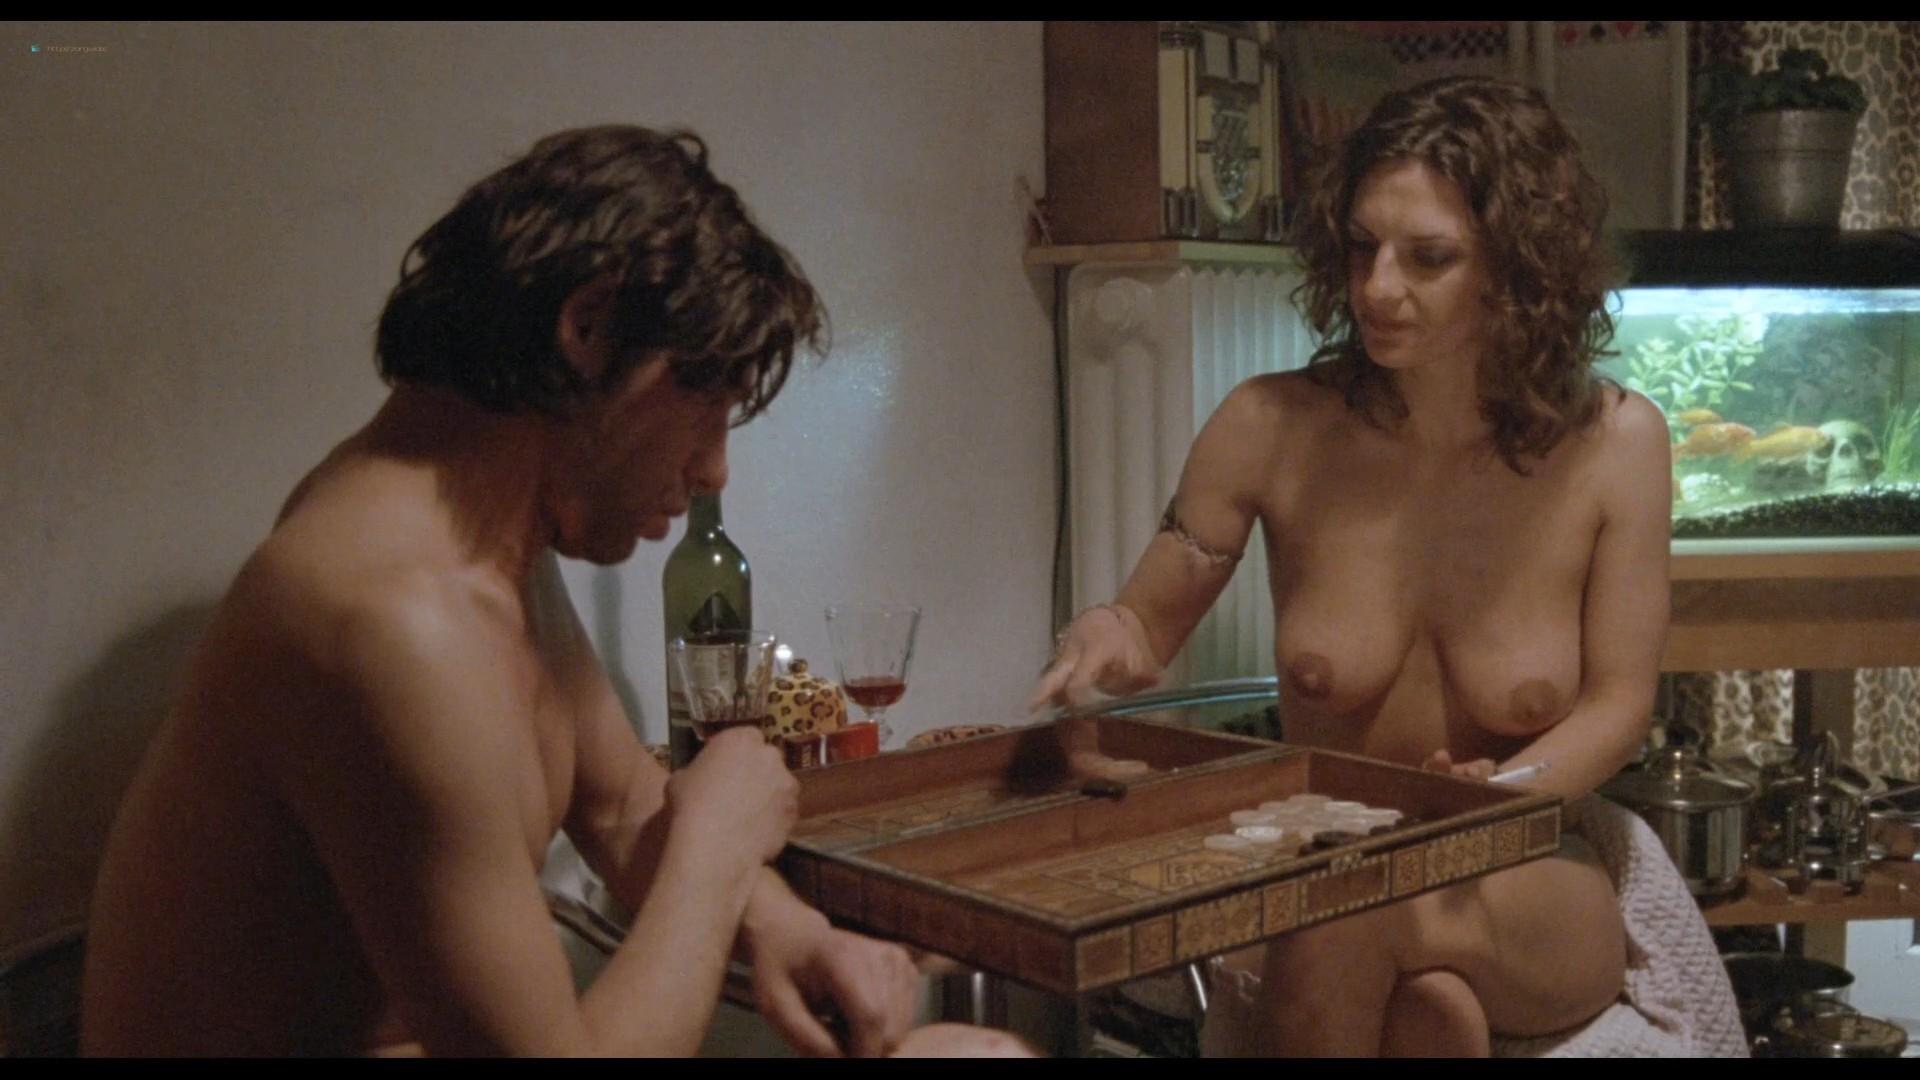 Sibel Kekilli nude full frontal and sex Catrin Striebeck nude - Head-On (2004) HD 1080p BluRay (r) (15)